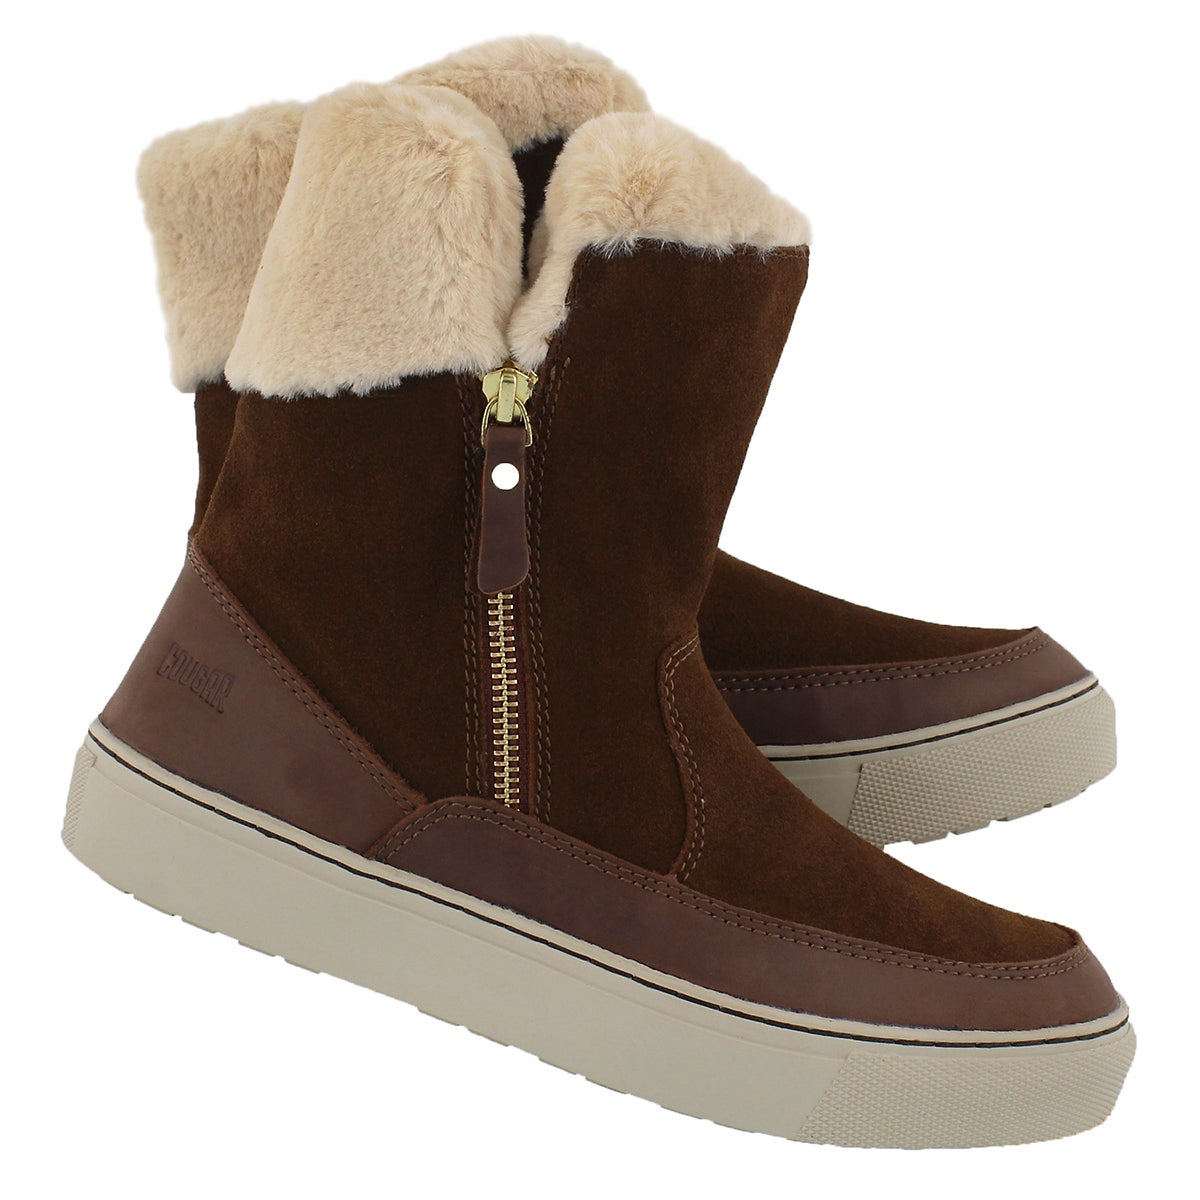 Lds Dresden brn wp side zip winter boot